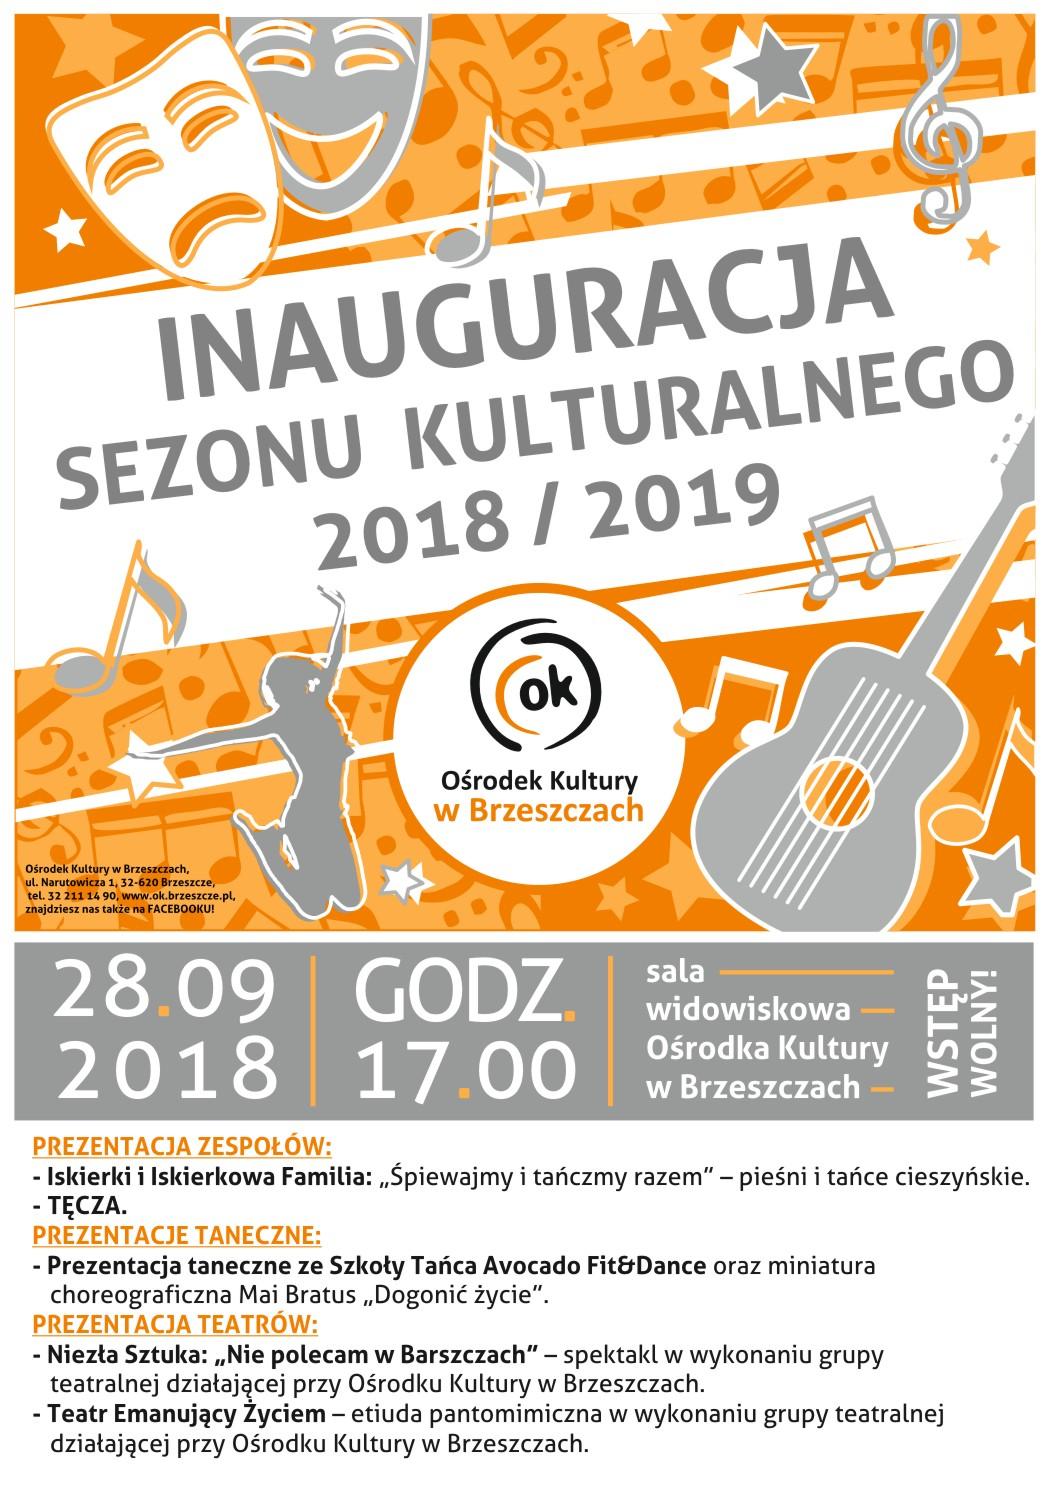 Inauguracja Sezonu Kulturalnego 2018/2019